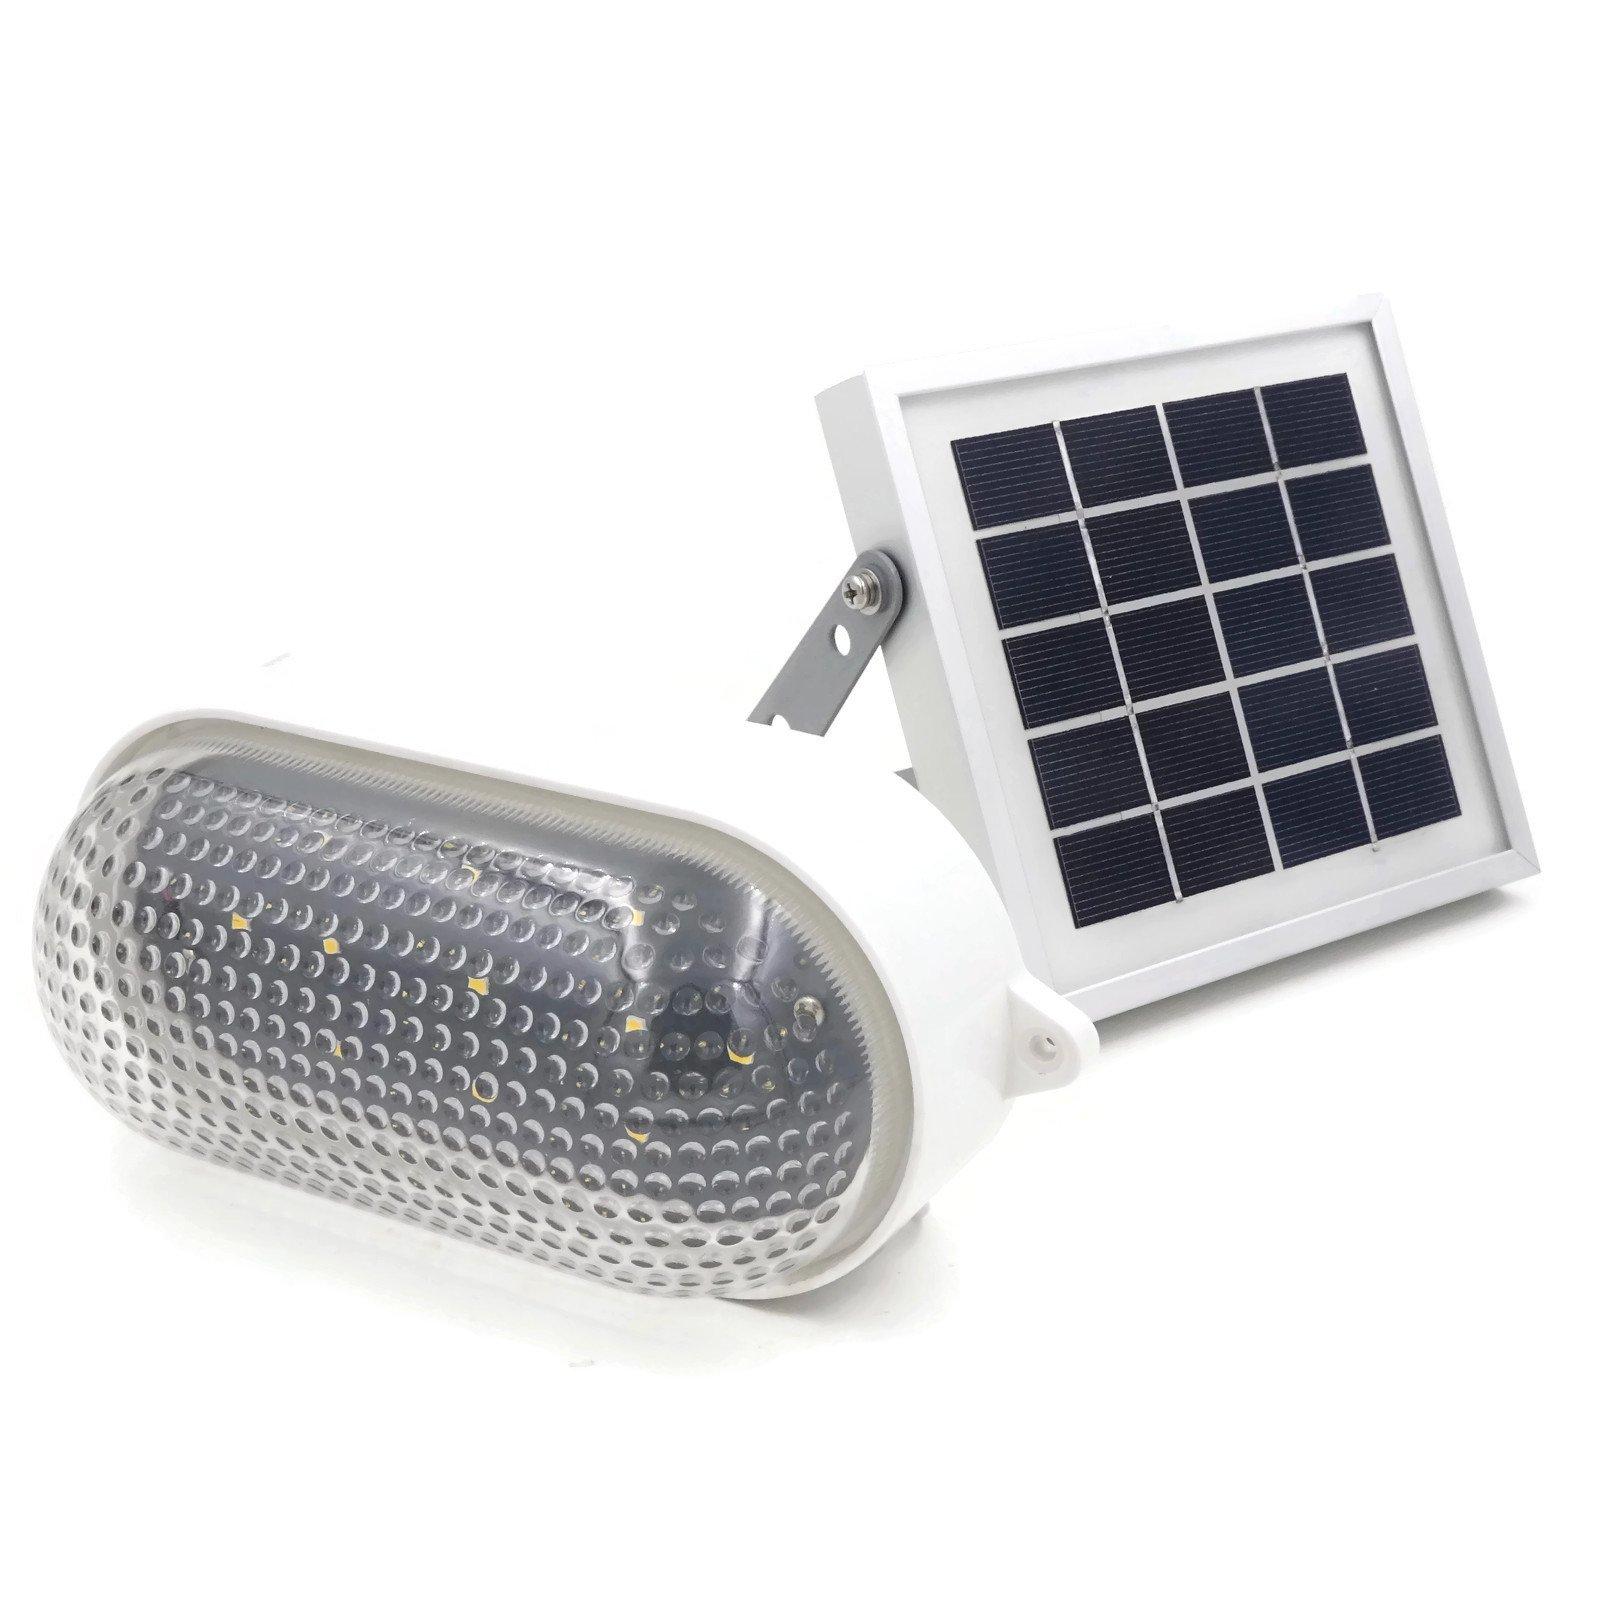 RIZE Solar Industrial Light (Warm White LED) // Solar Wall Light Vintage Style // Solar Shed Light // Dock Light